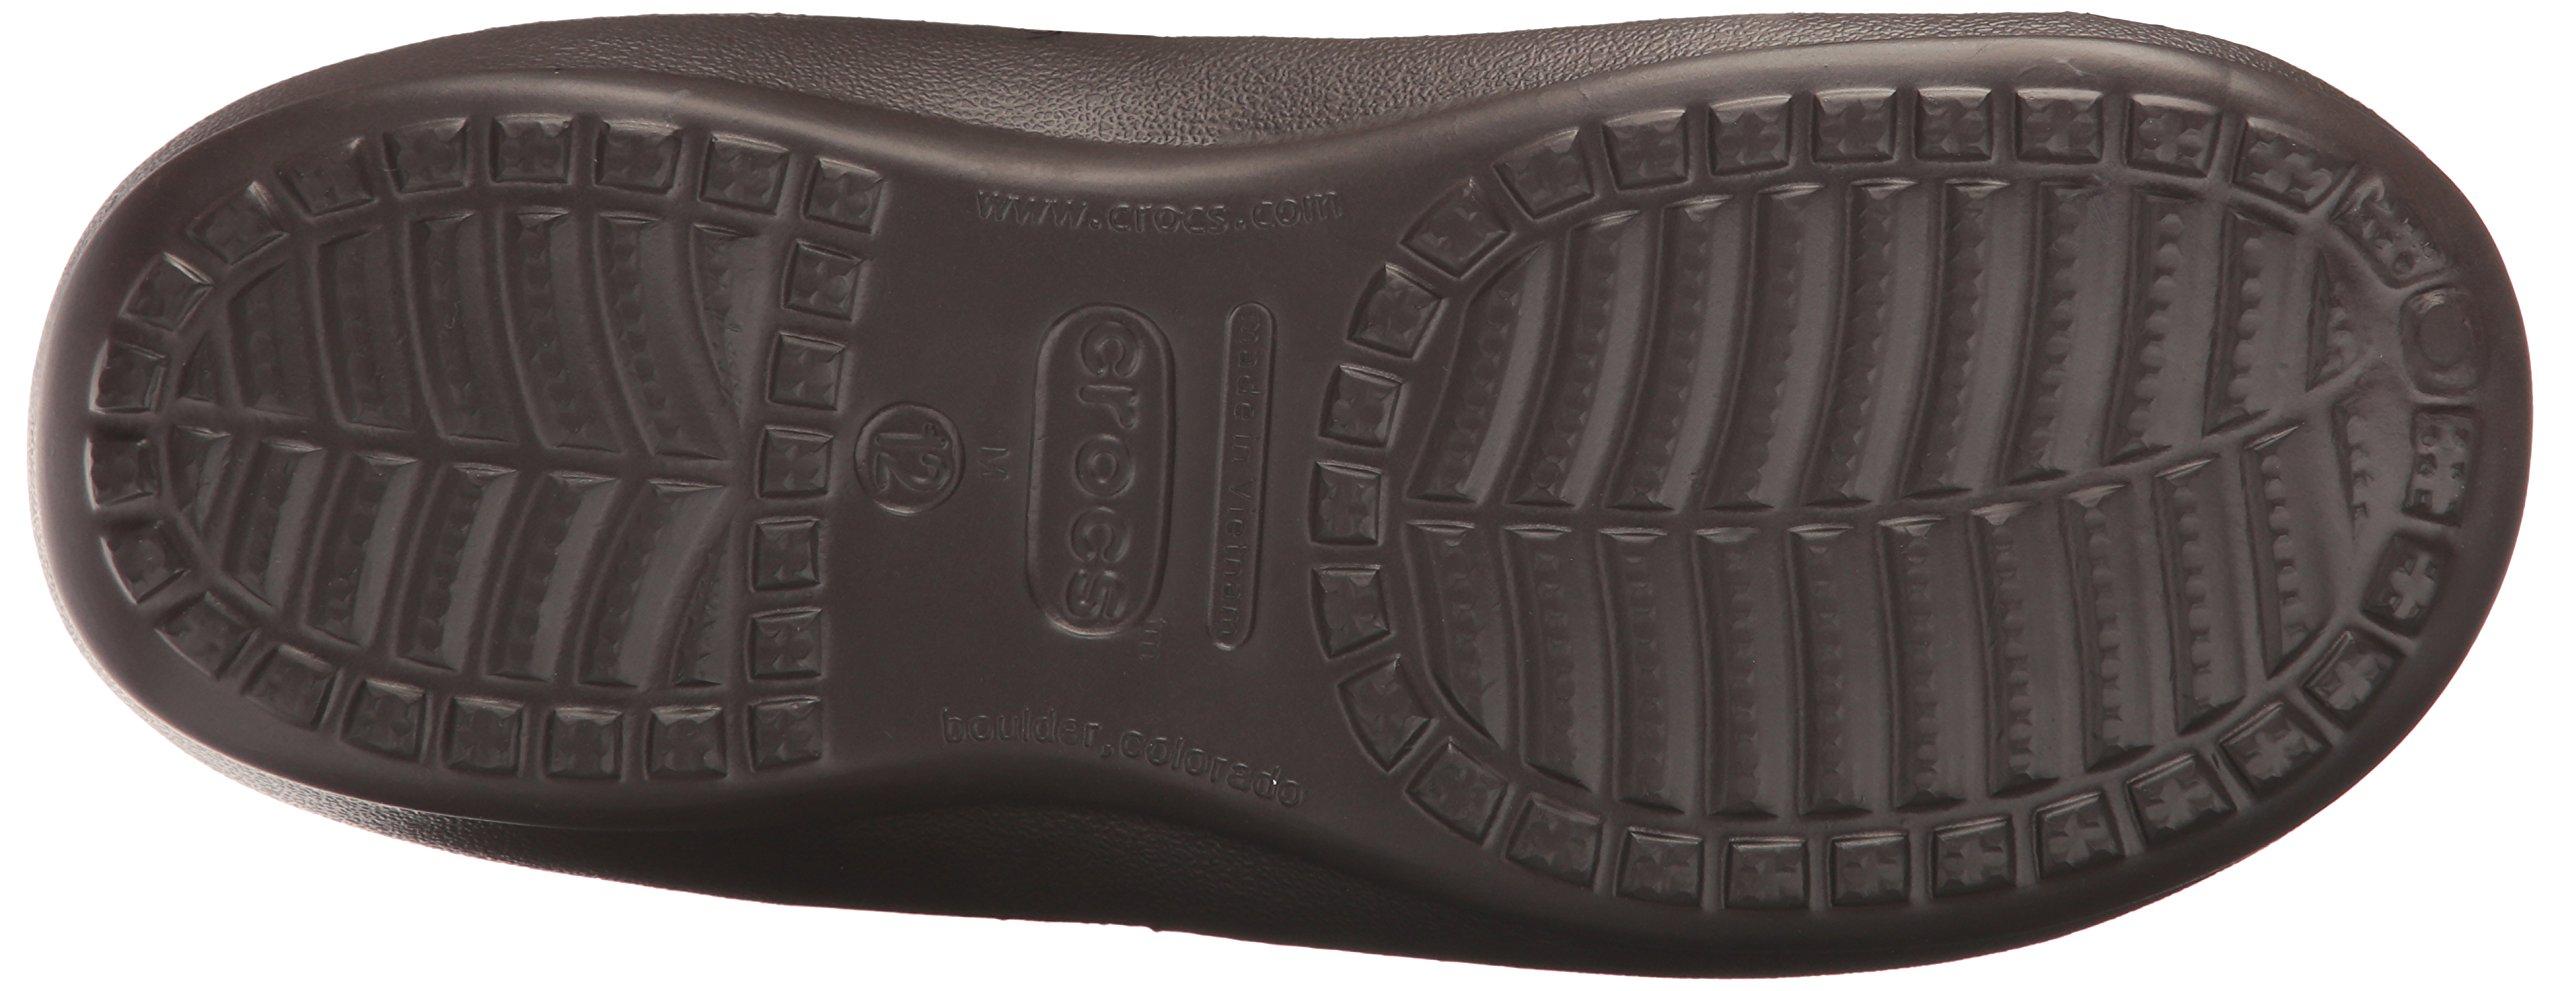 Crocs Athens Flip Flop, Espresso/Walnut, 10 US Men / 12 US Women by Crocs (Image #3)